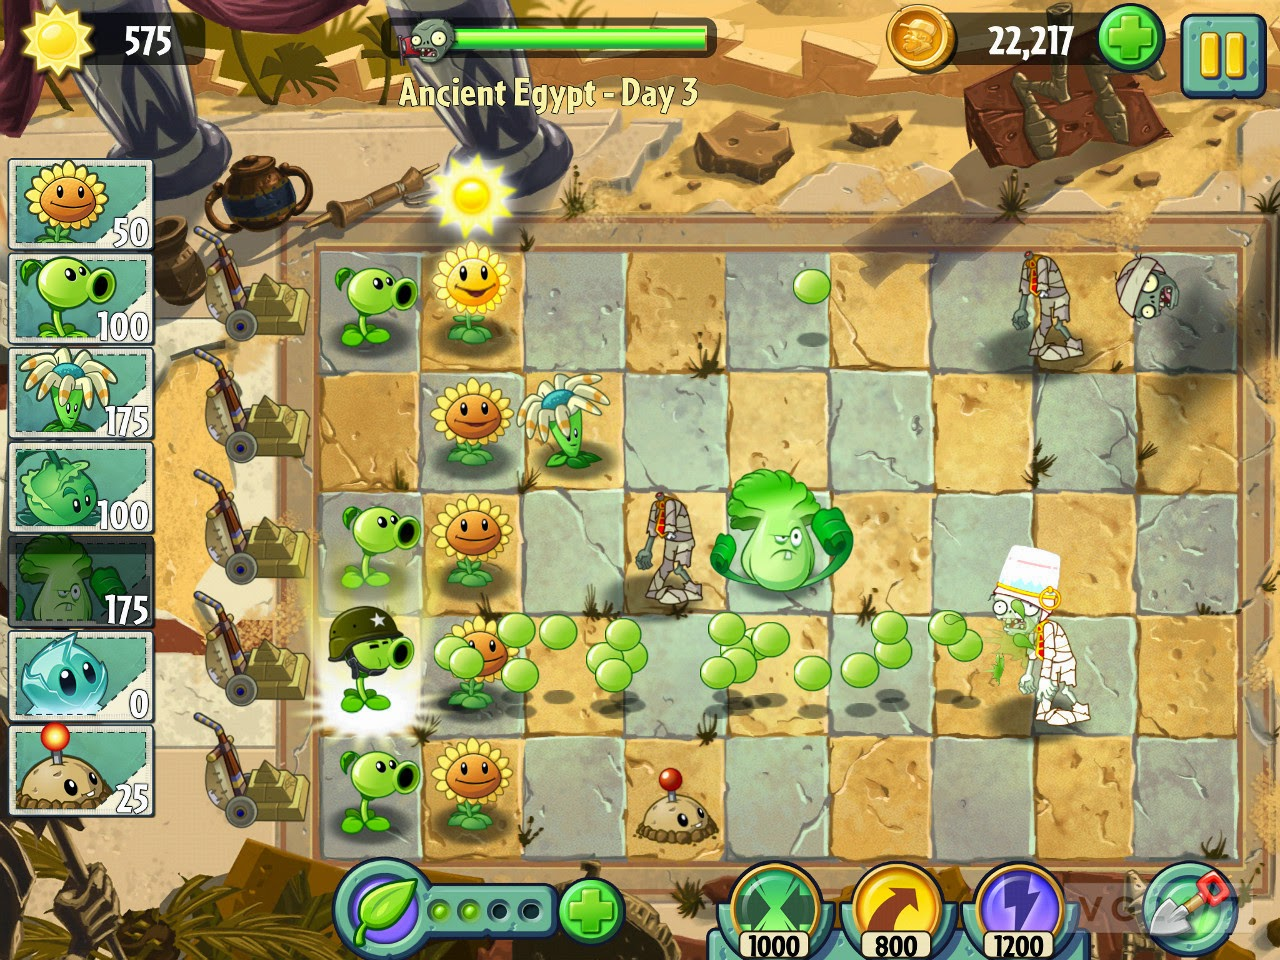 Plants vs Zombies 2 pc free download no survey no password